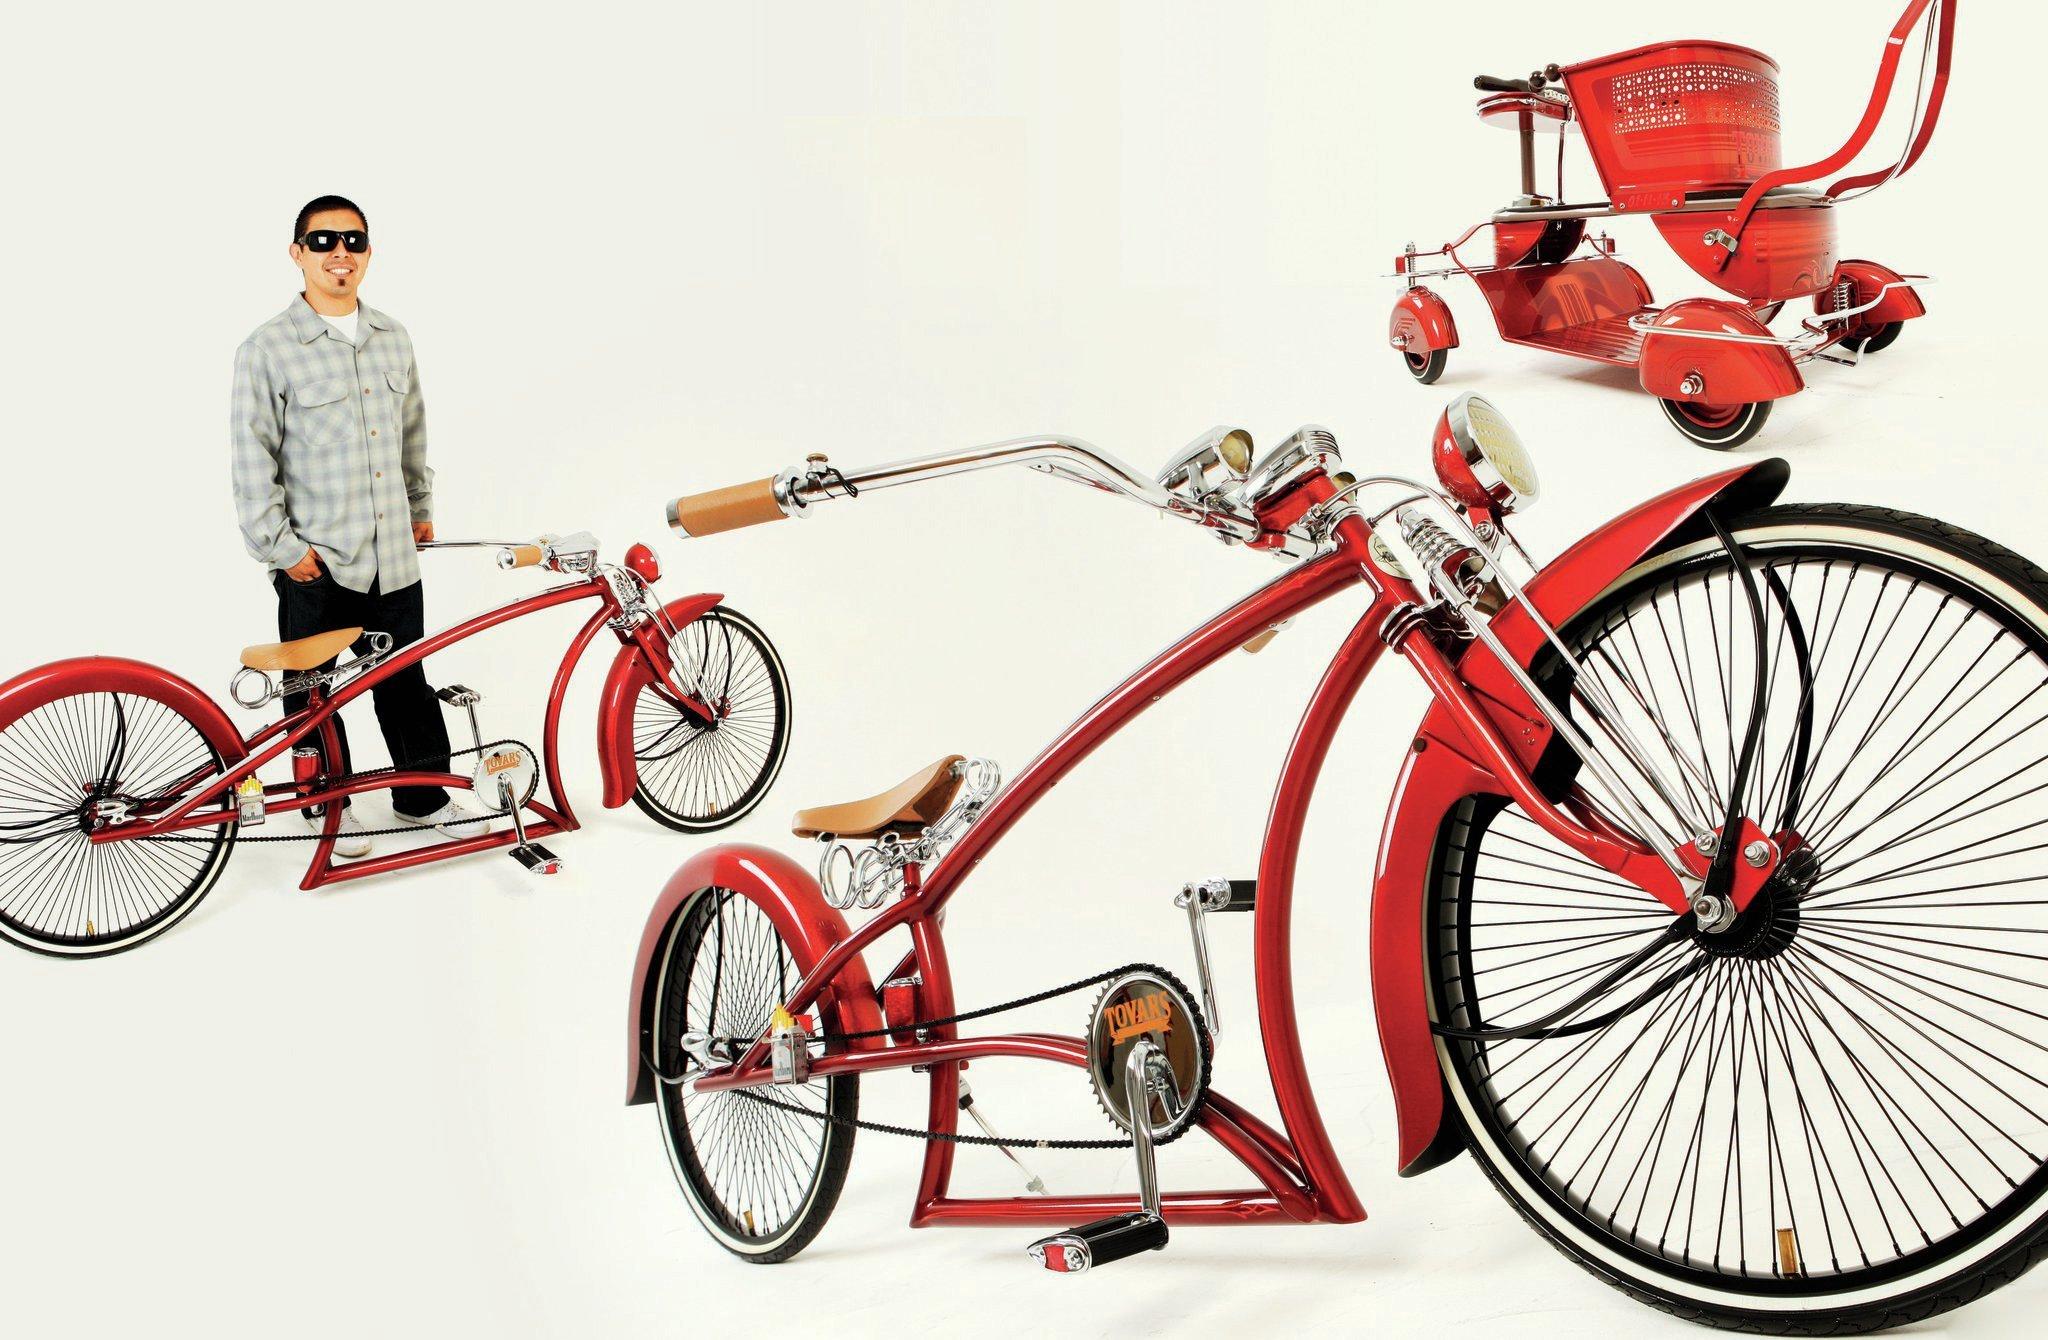 lowrider custom stance tuning bike bicycle e wallpaper. Black Bedroom Furniture Sets. Home Design Ideas